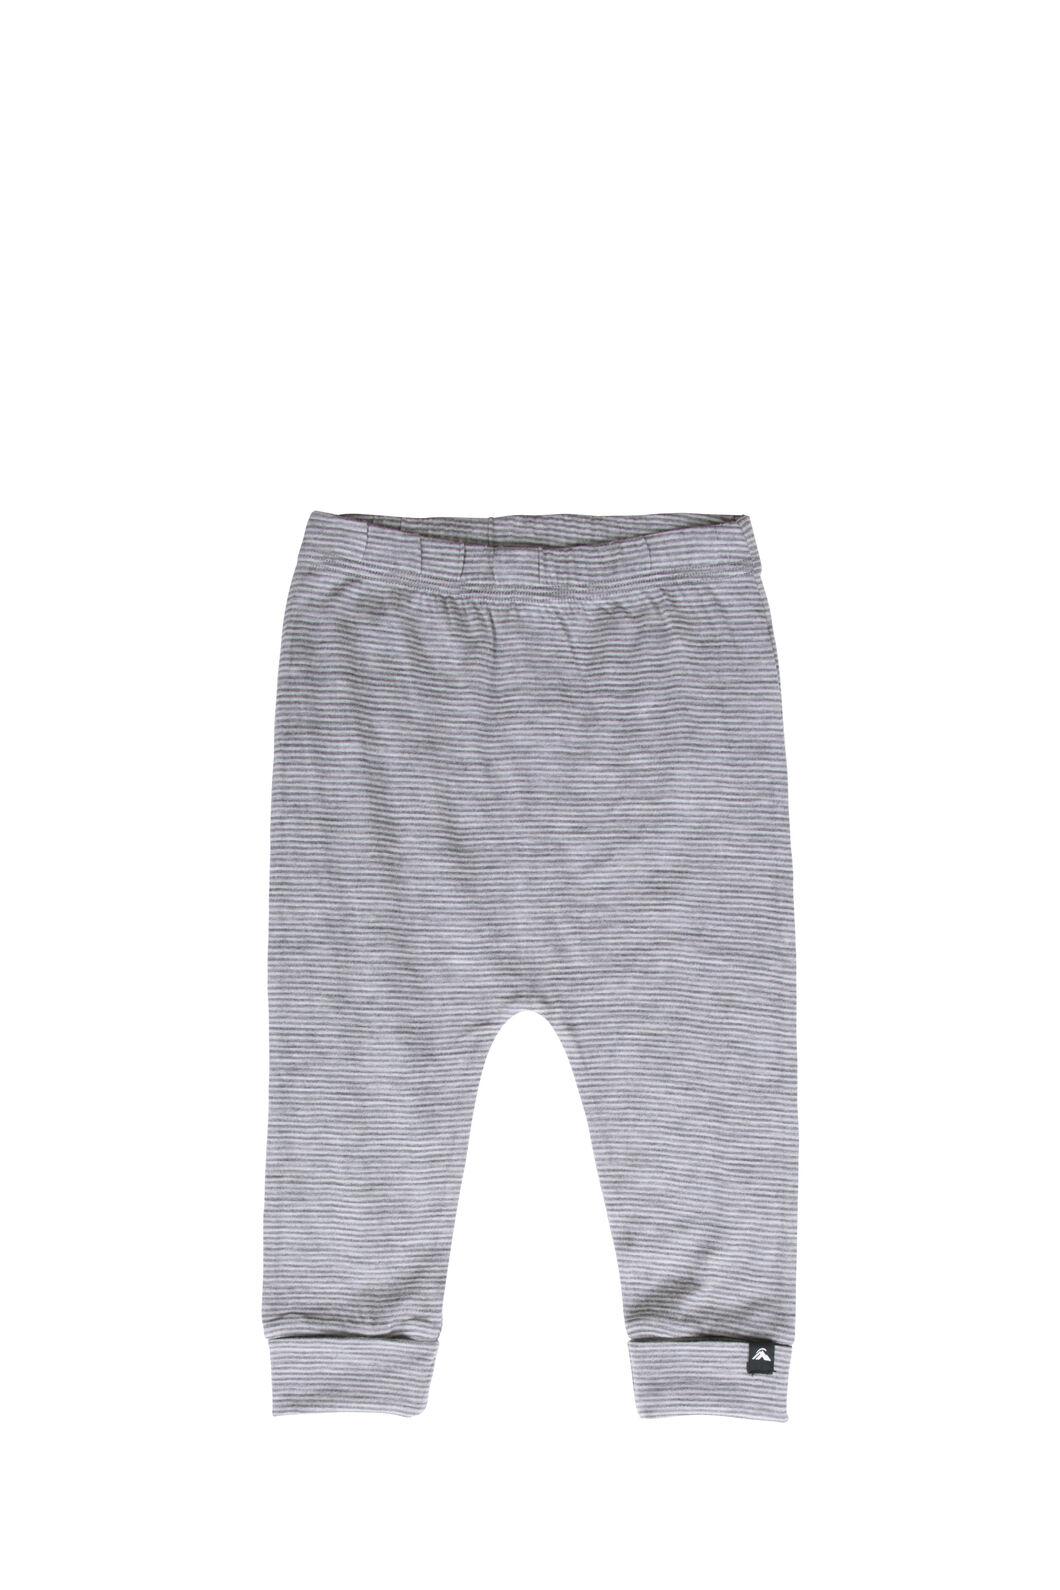 Macpac 150 Merino Long Johns - Baby, Light Grey Stripe, hi-res